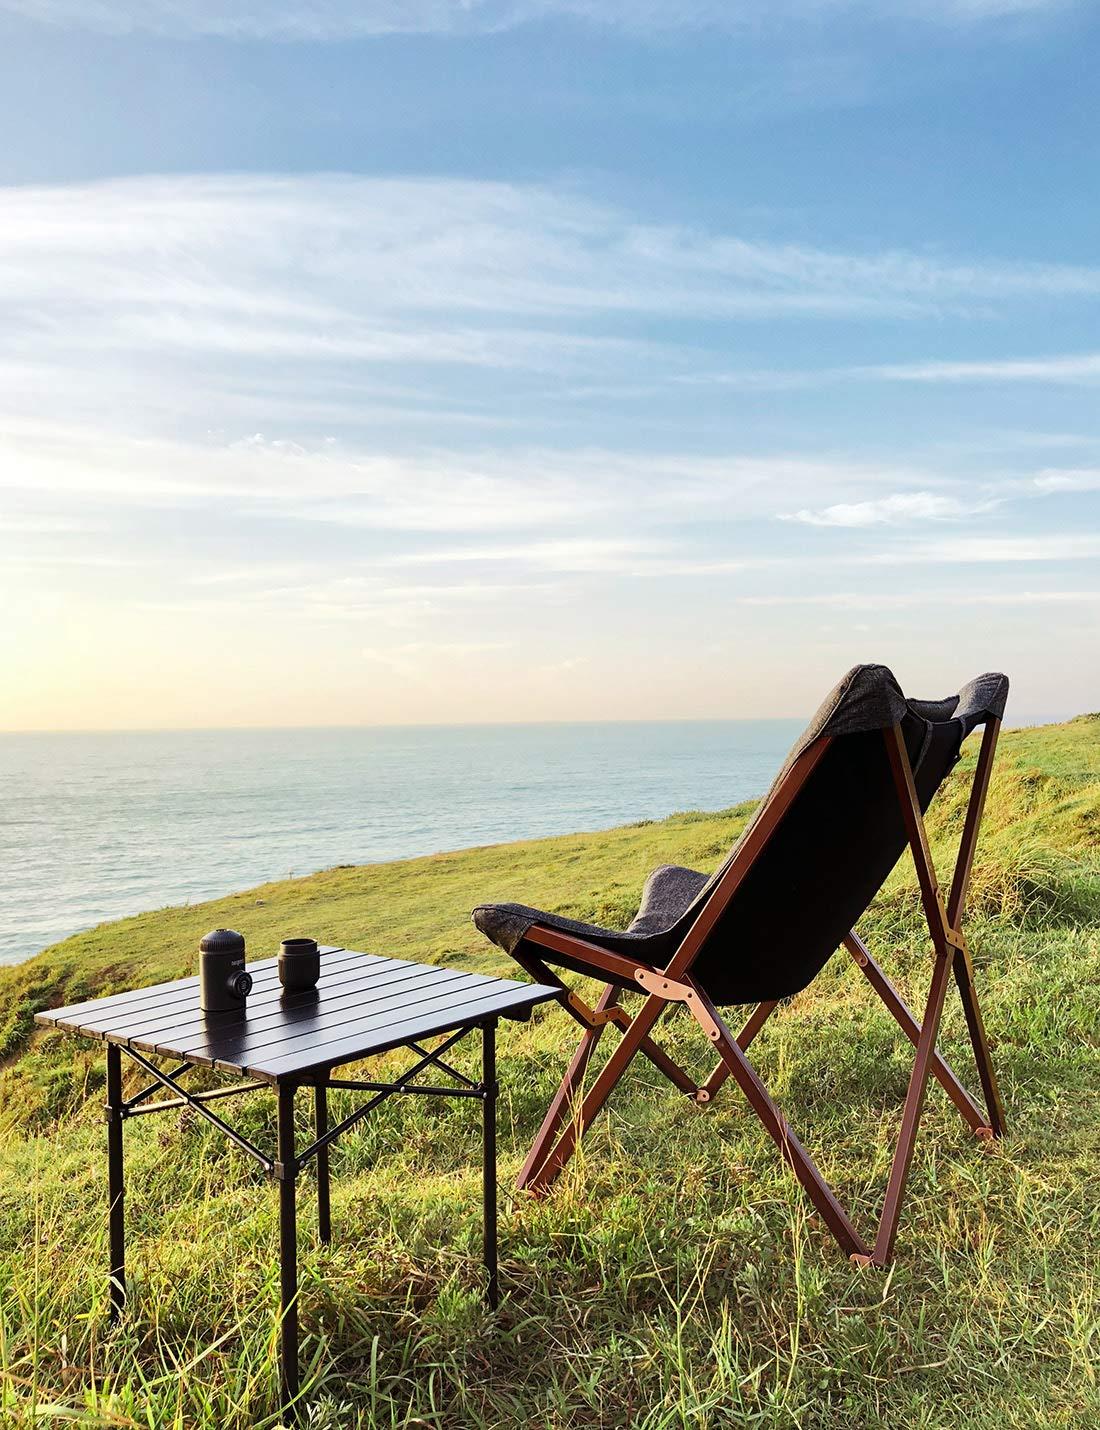 Full Size of Lounge Klappstuhl Green Klappsessel Gepolstert Suhu Camping Stuhl Sessel Modern Design Retro Möbel Garten Sofa Loungemöbel Holz Set Günstig Wohnzimmer Lounge Klappstuhl